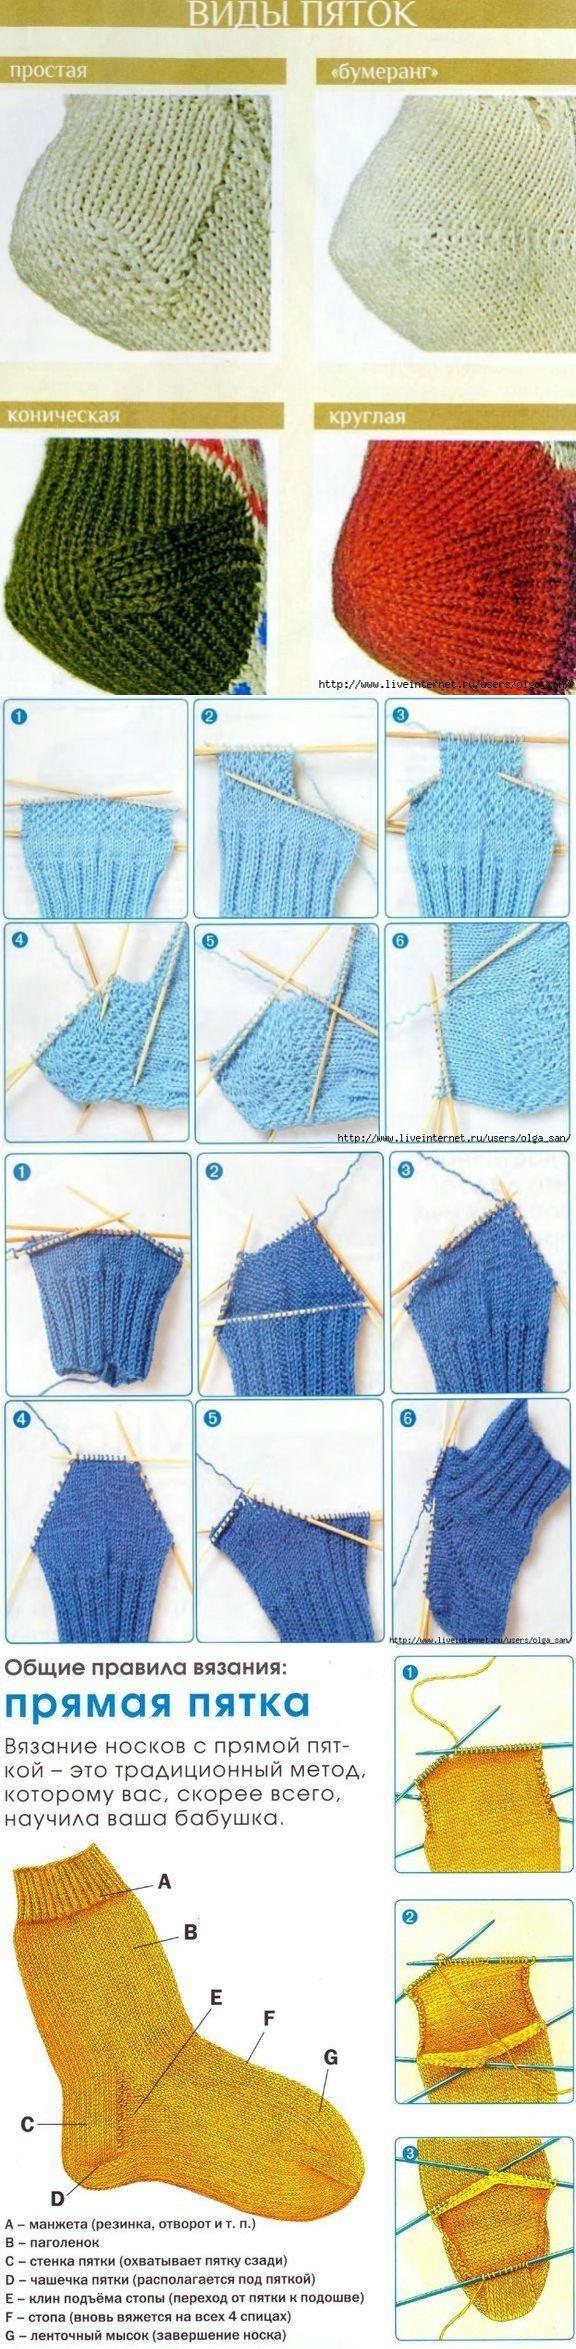 Вязание пятка бумеранг спицами